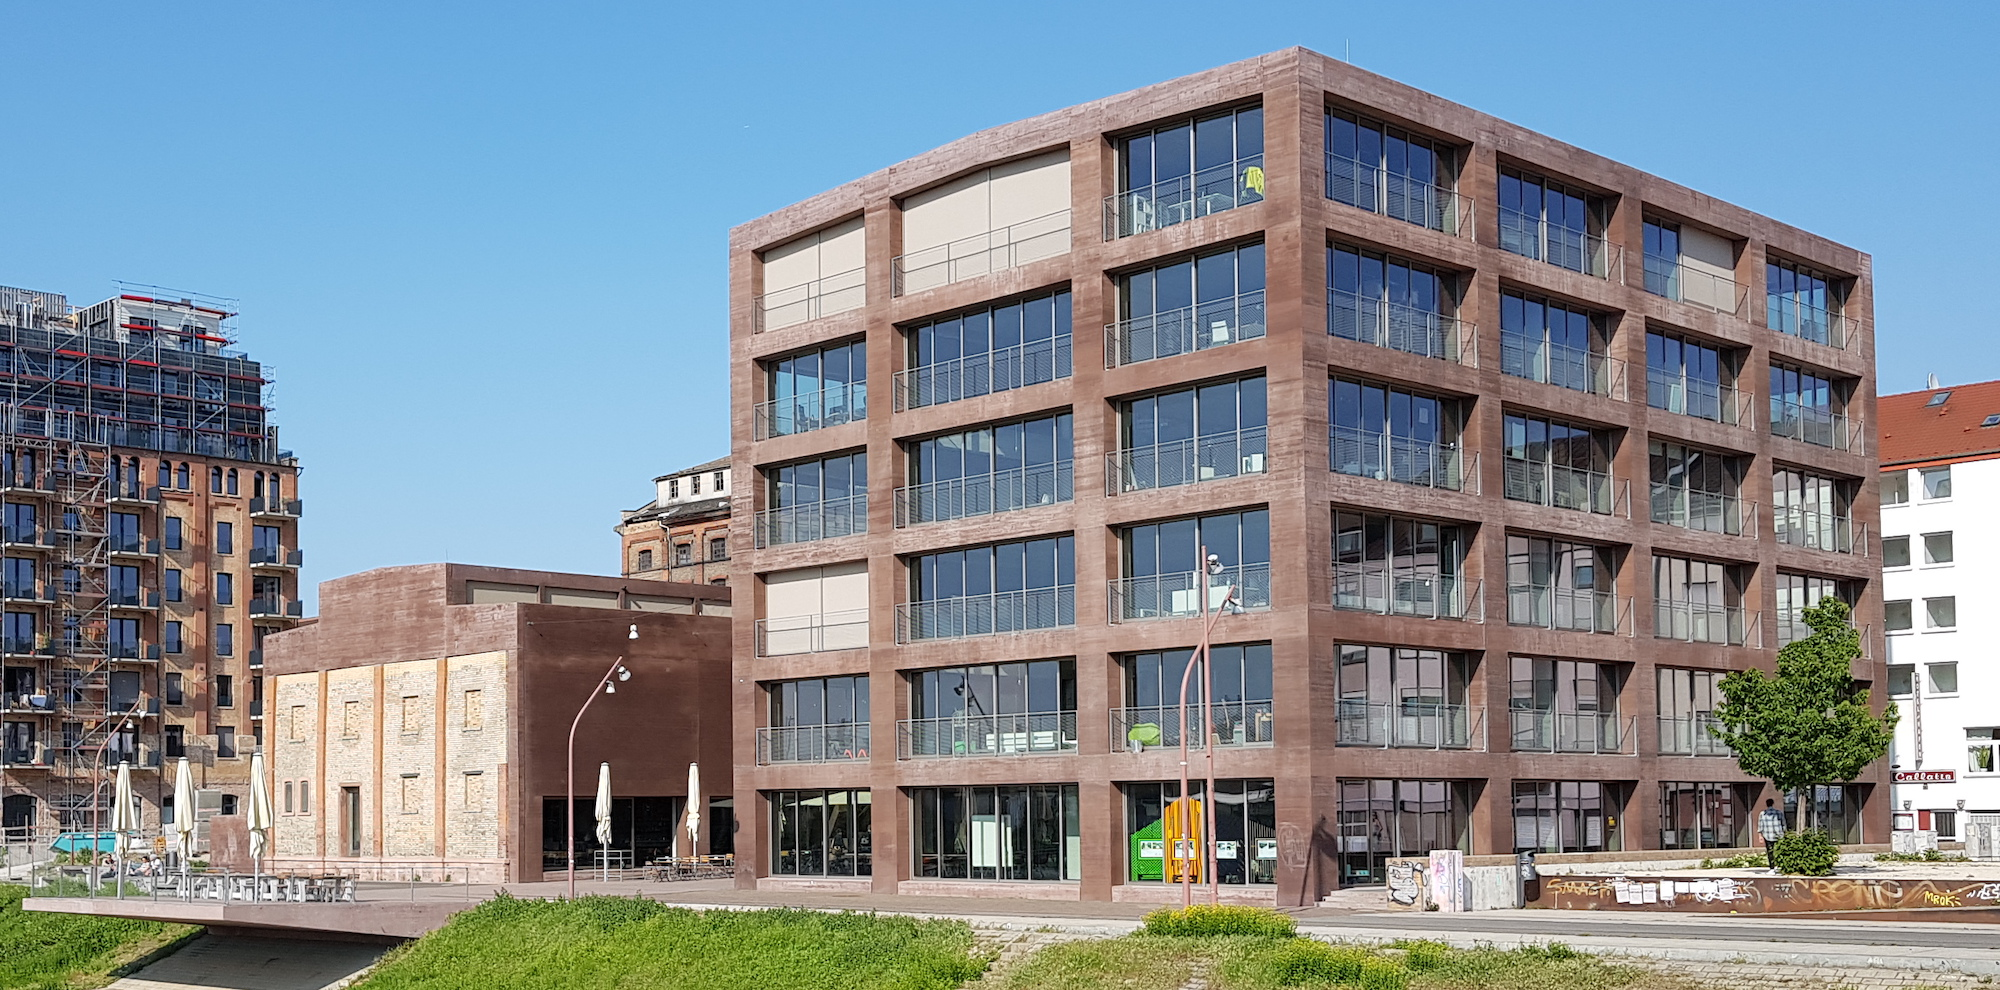 C-HUB in Mannheim